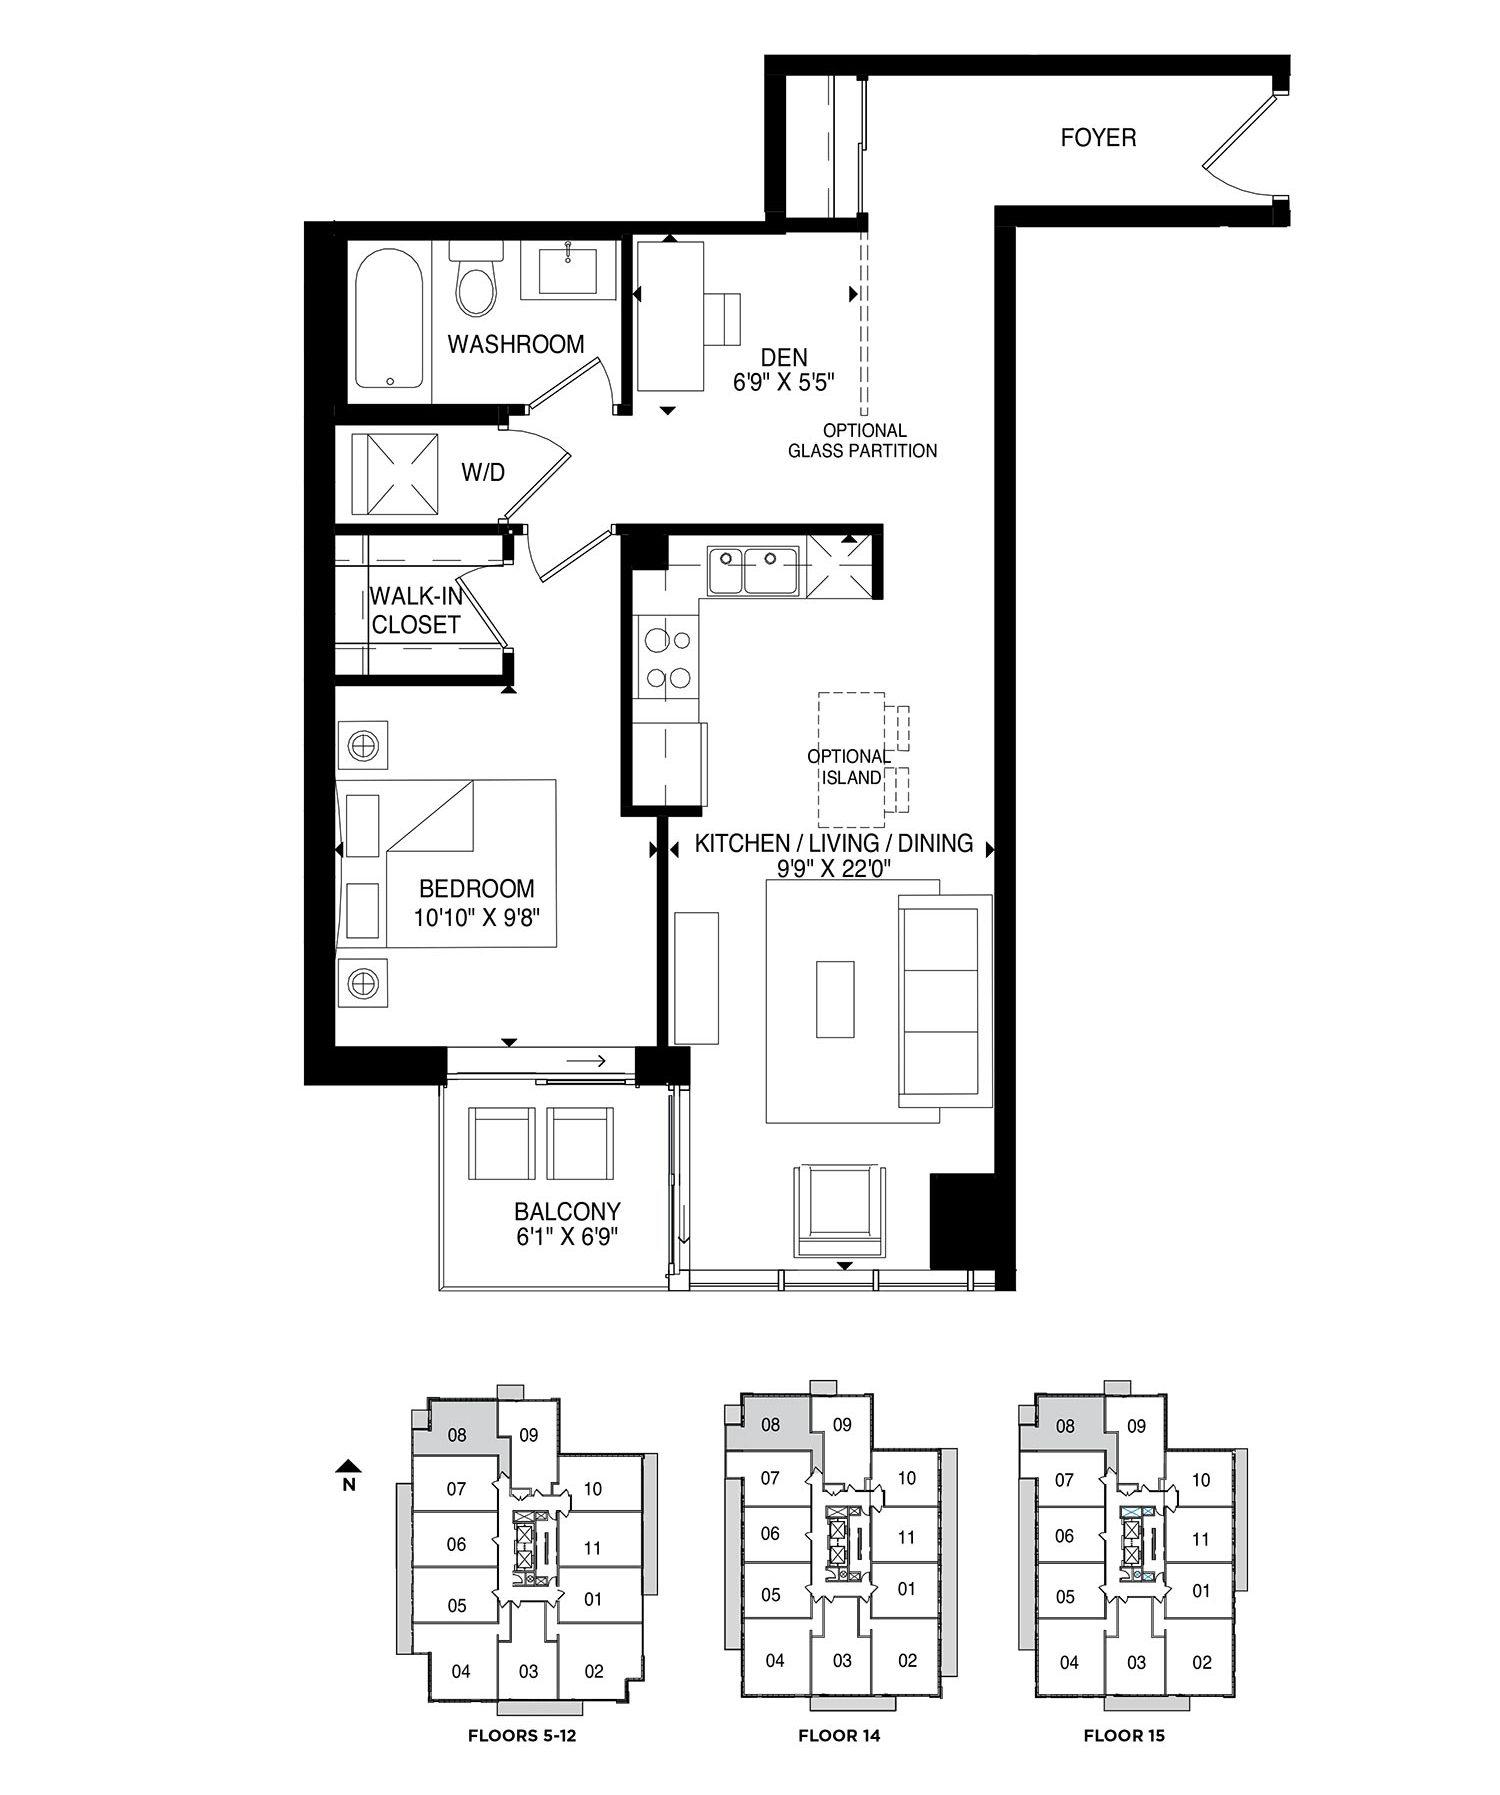 dorset_floorplan_pdf_img